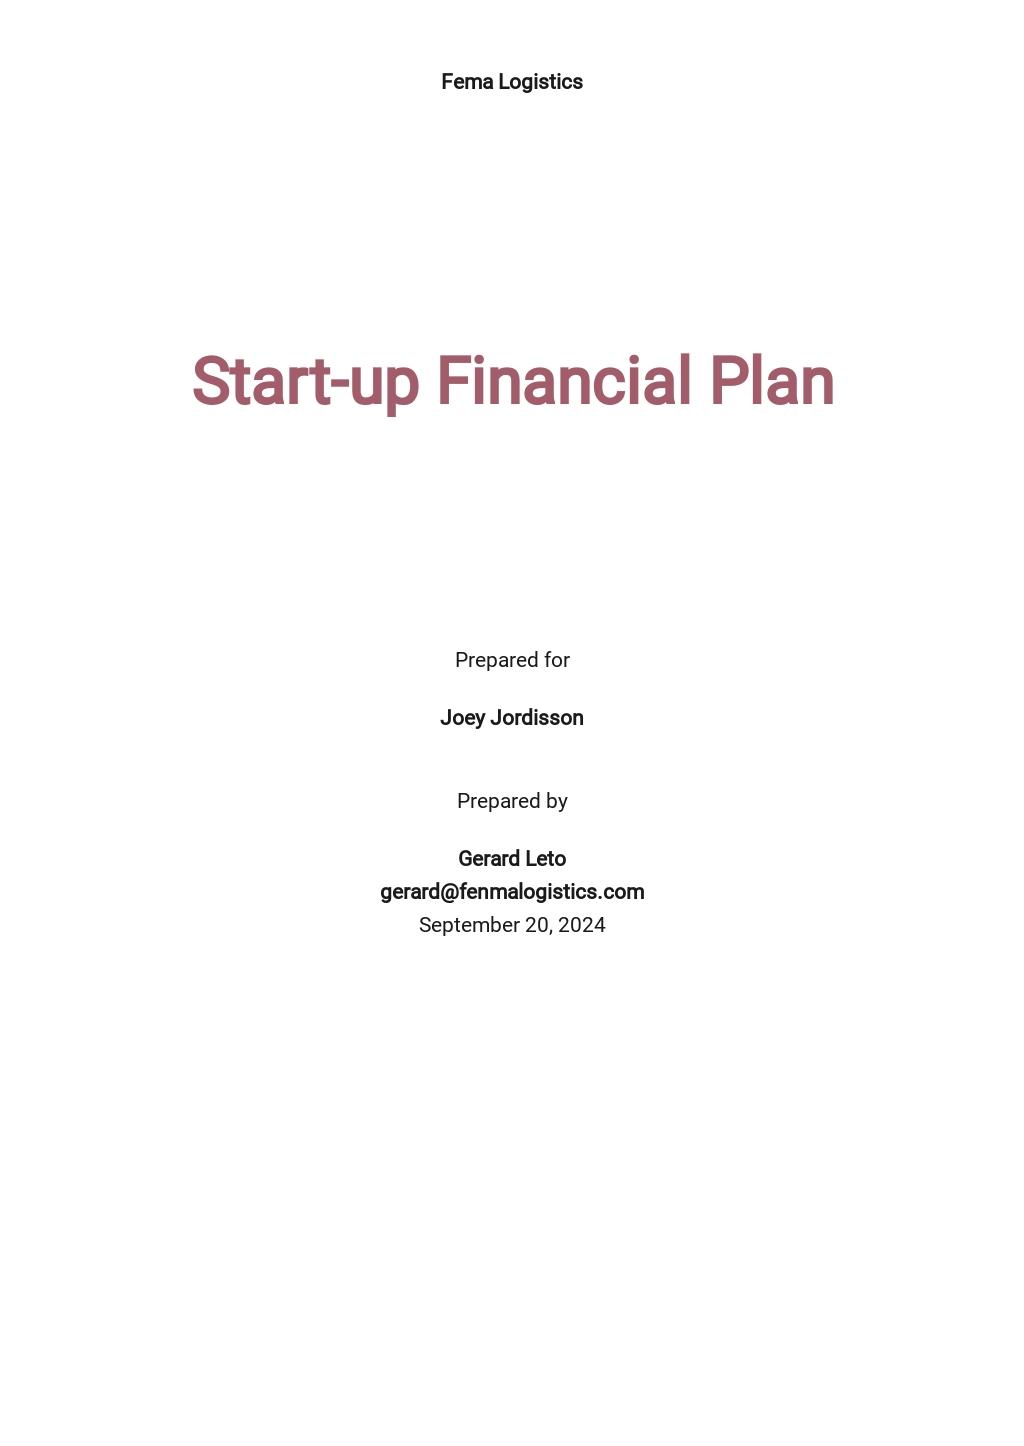 Business Start-Up Project Plan Template